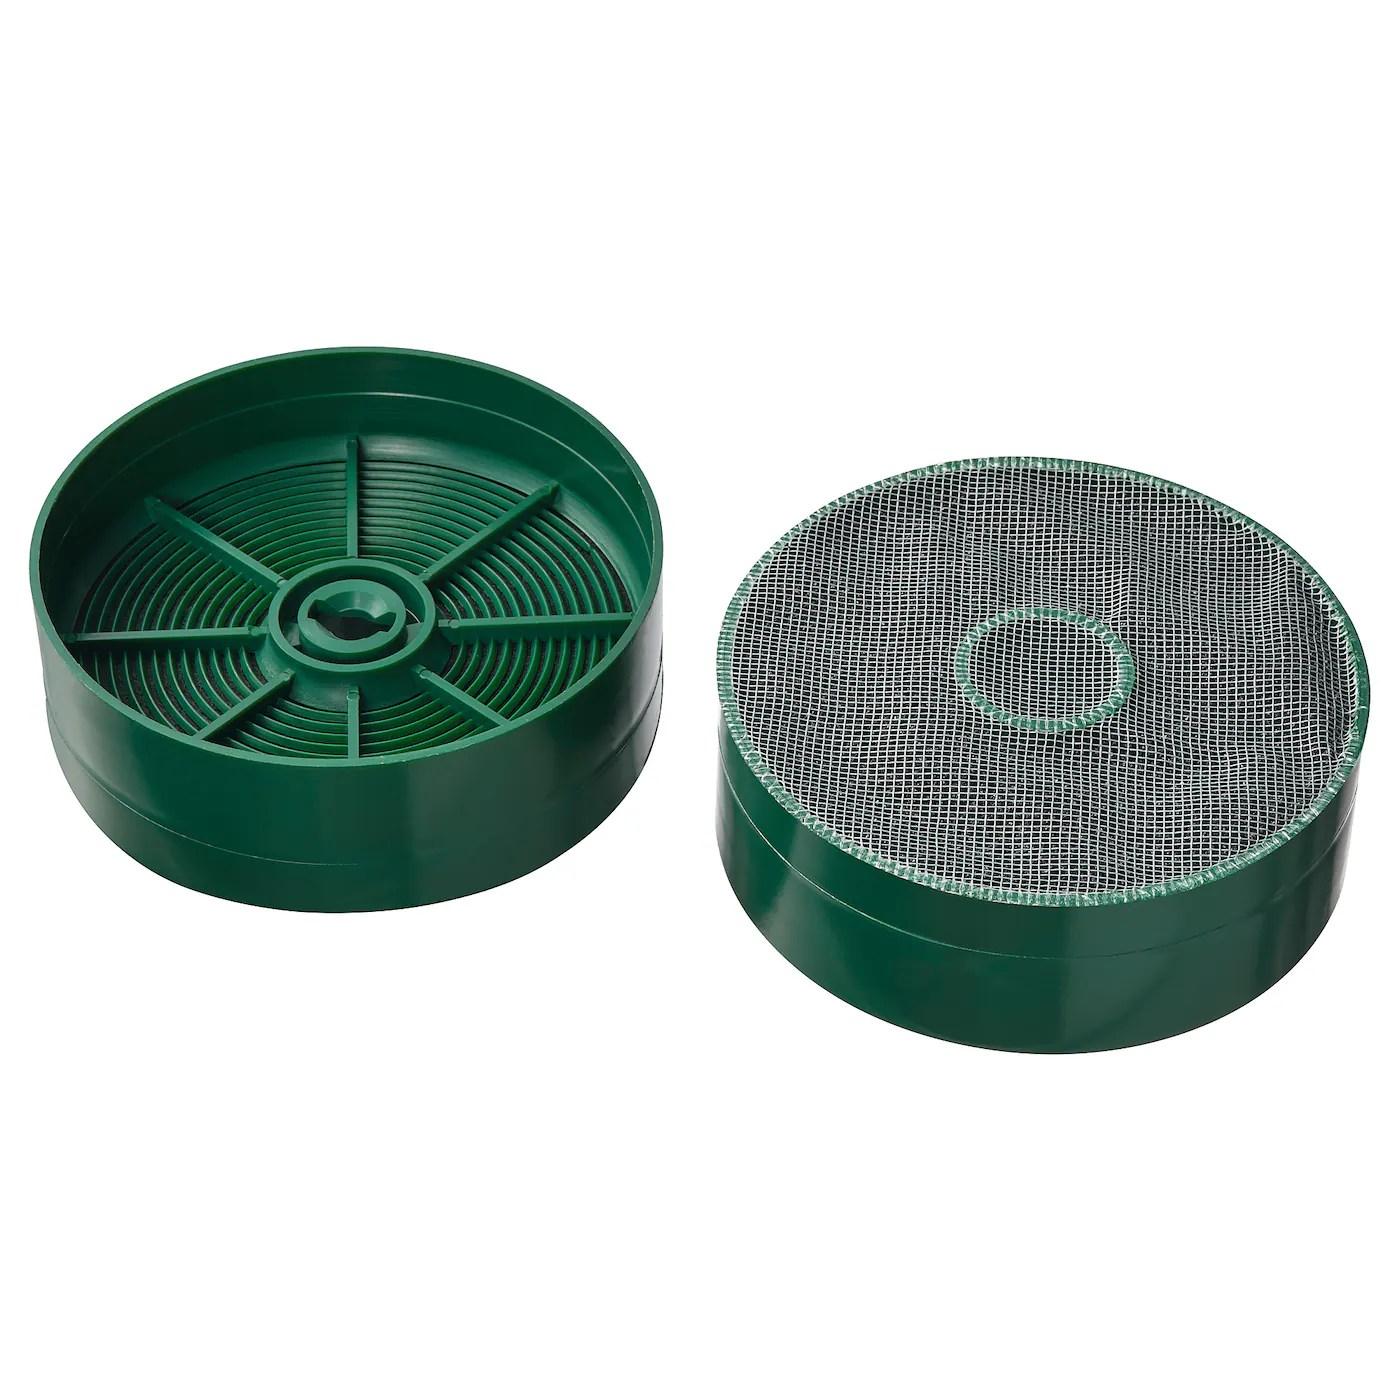 nyttig fil 120 filtre a charbon 2 pieces